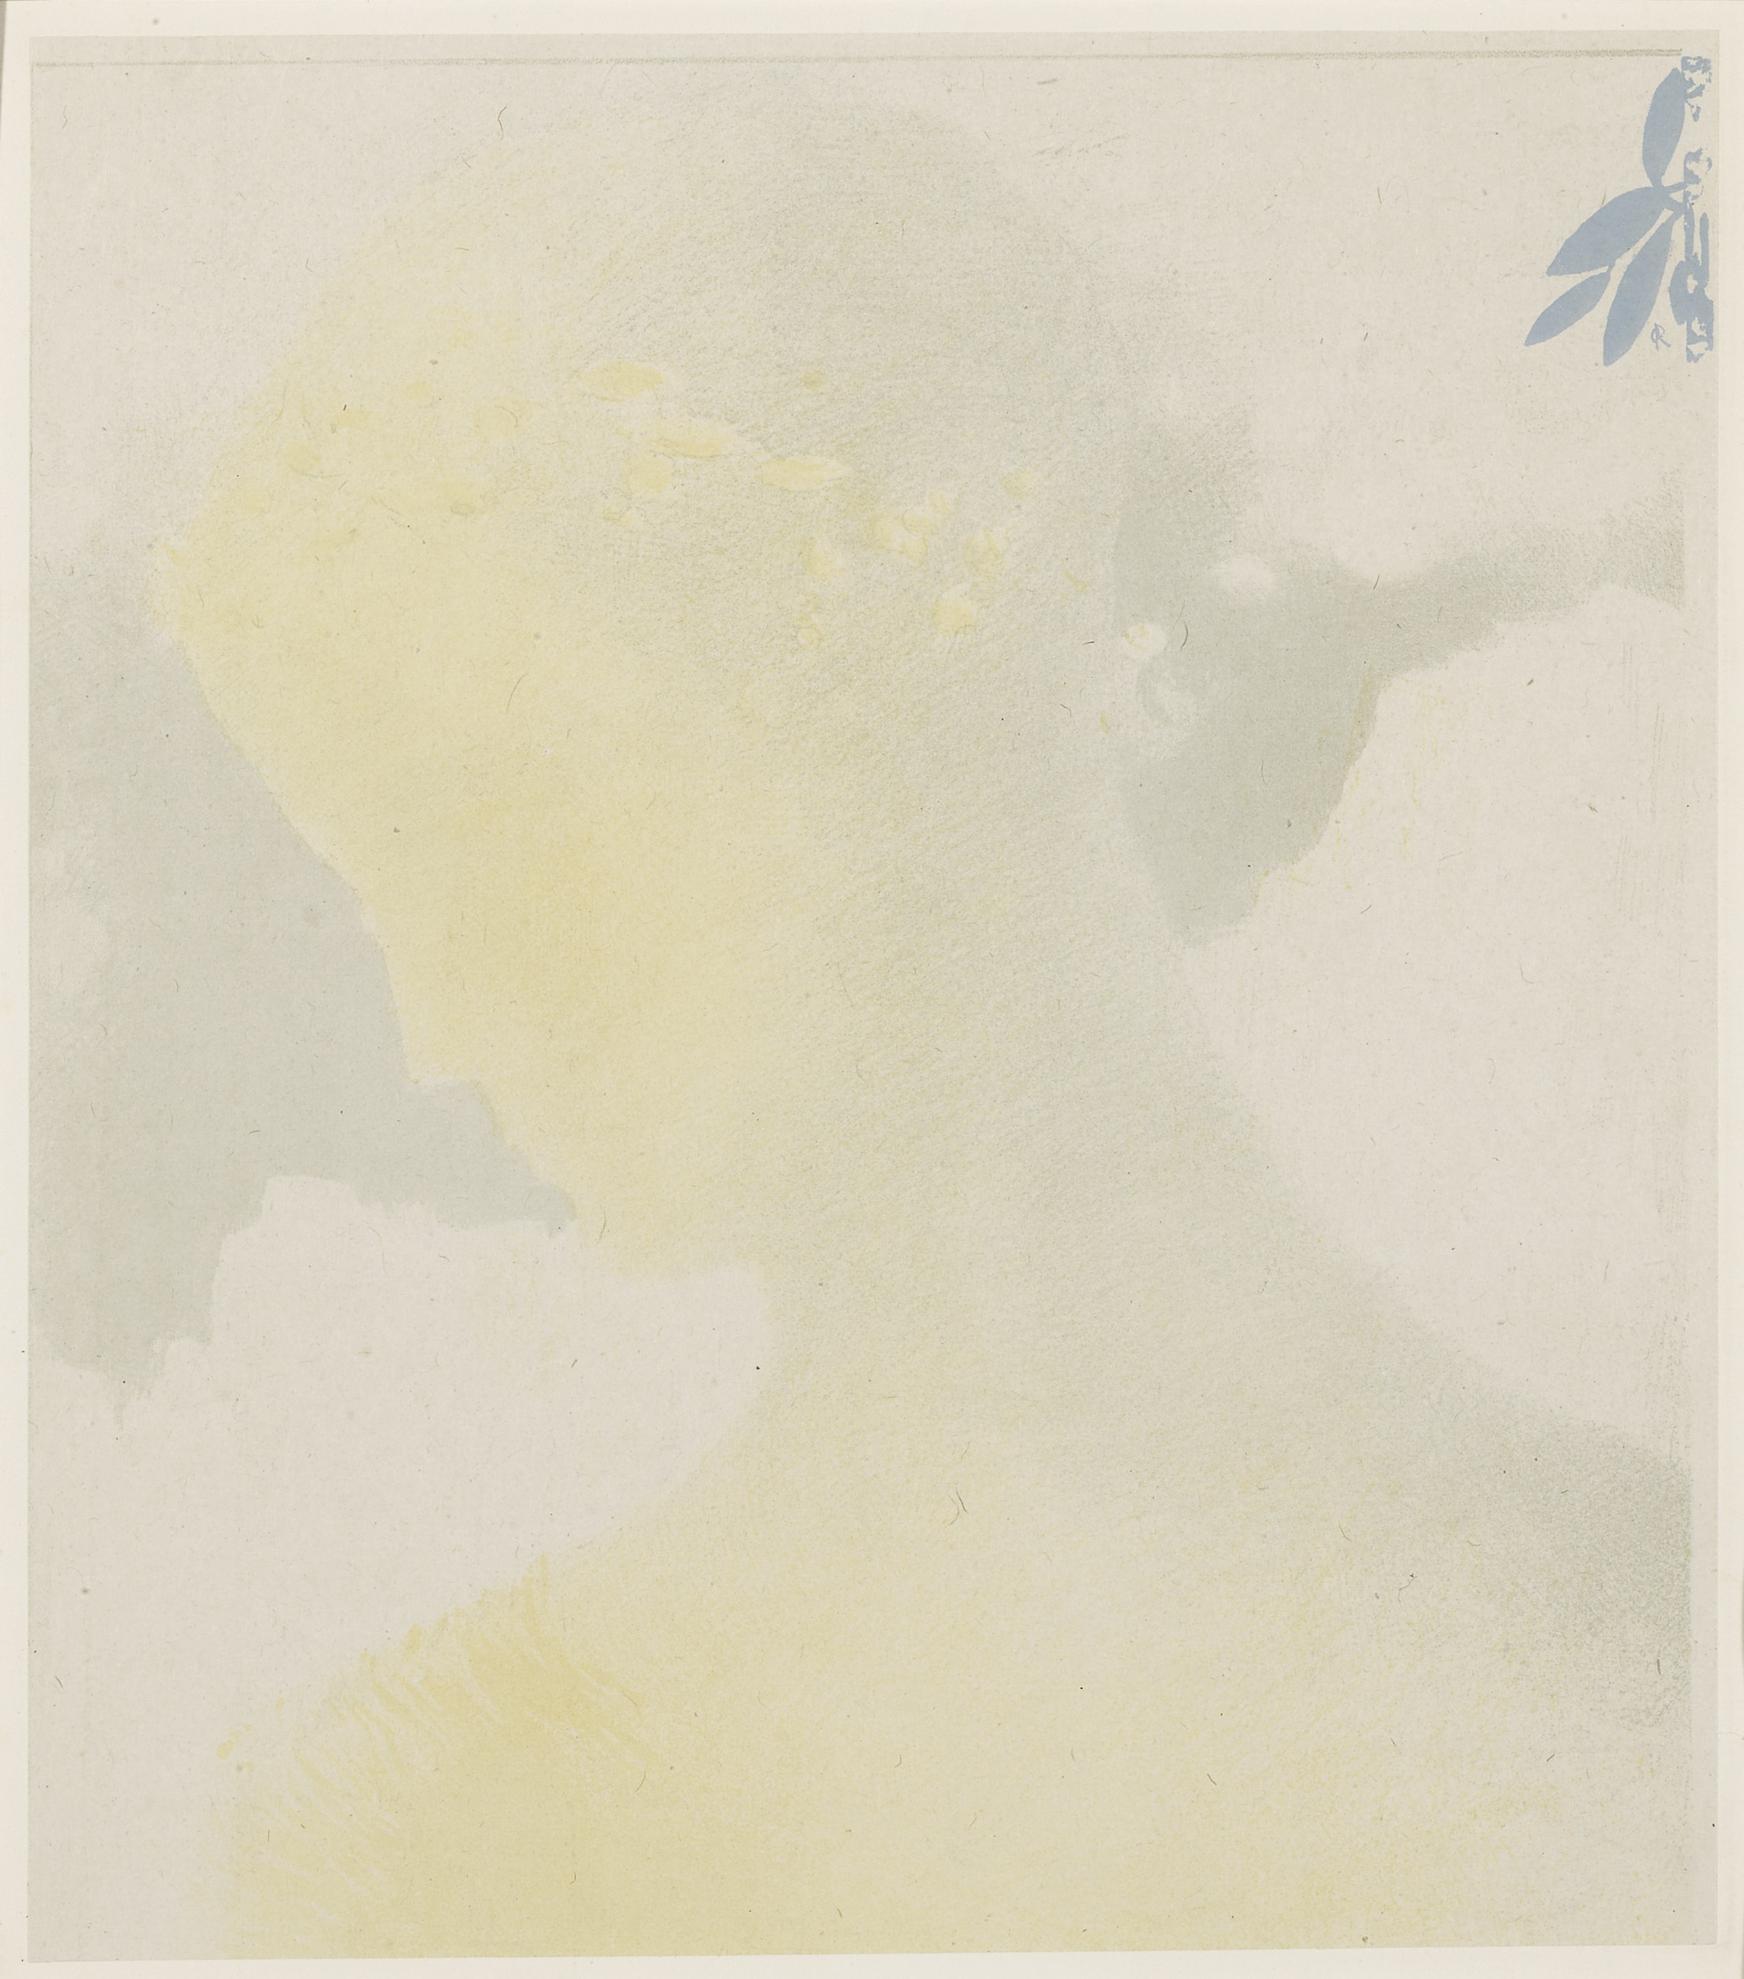 Odilon Redon-Beatrice (Mellerio 168)-1897